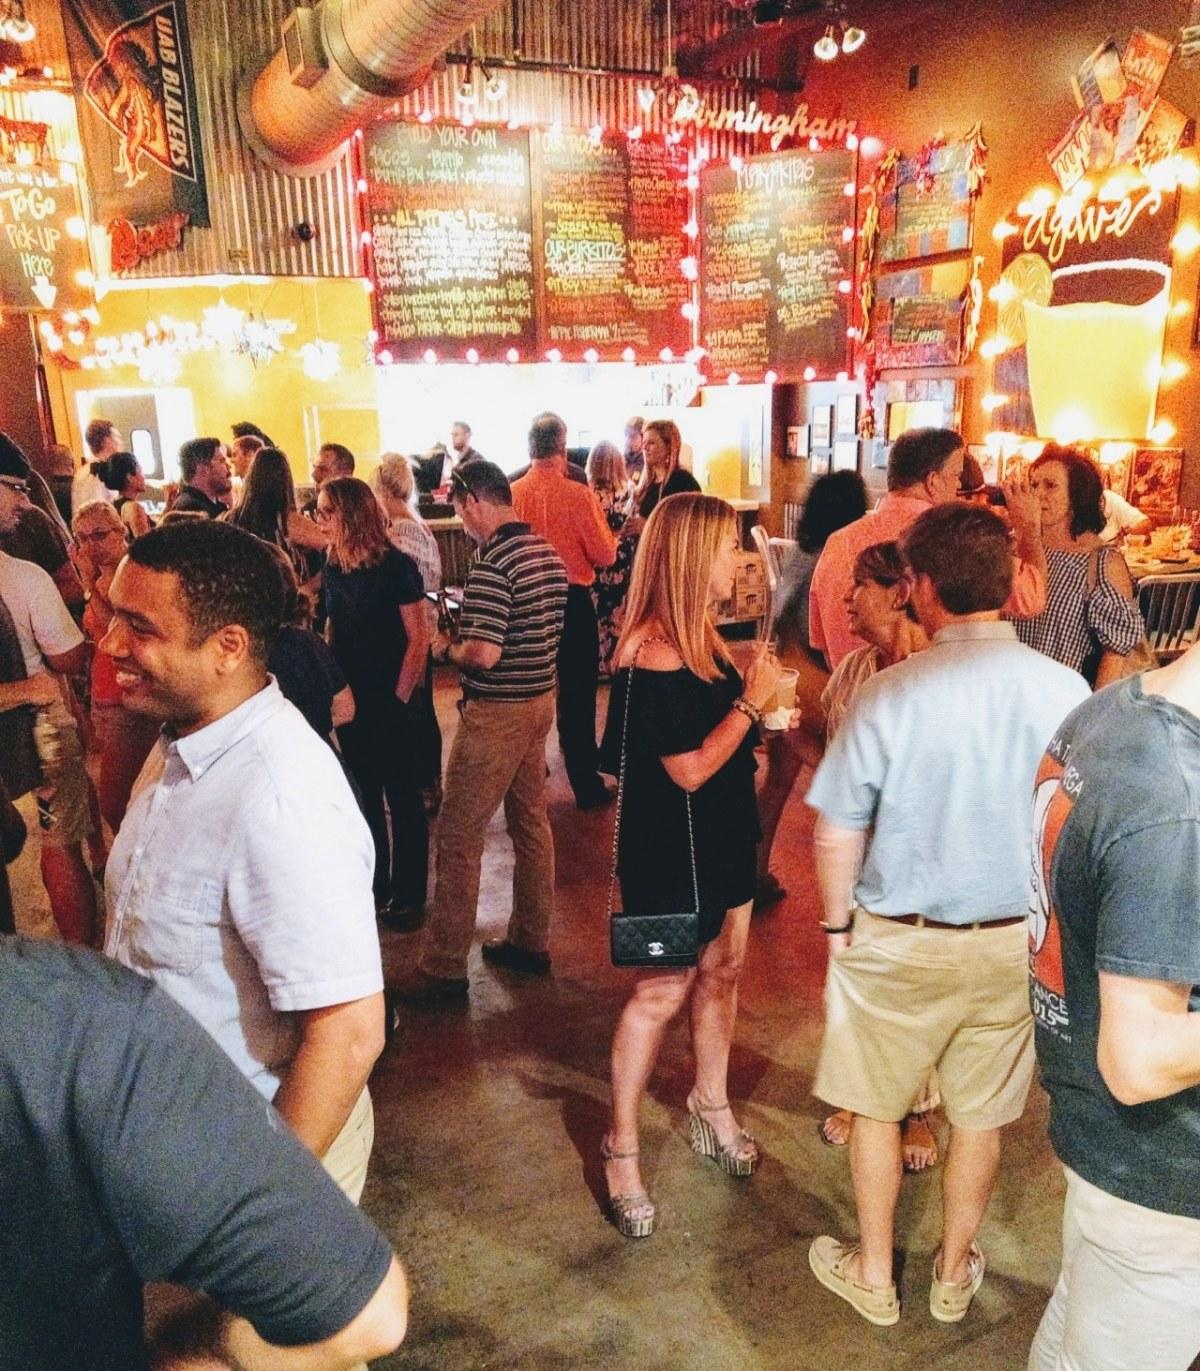 Taco Mama Preview Party-The Waites-New Development-Downtown-Birmingham-Alabama